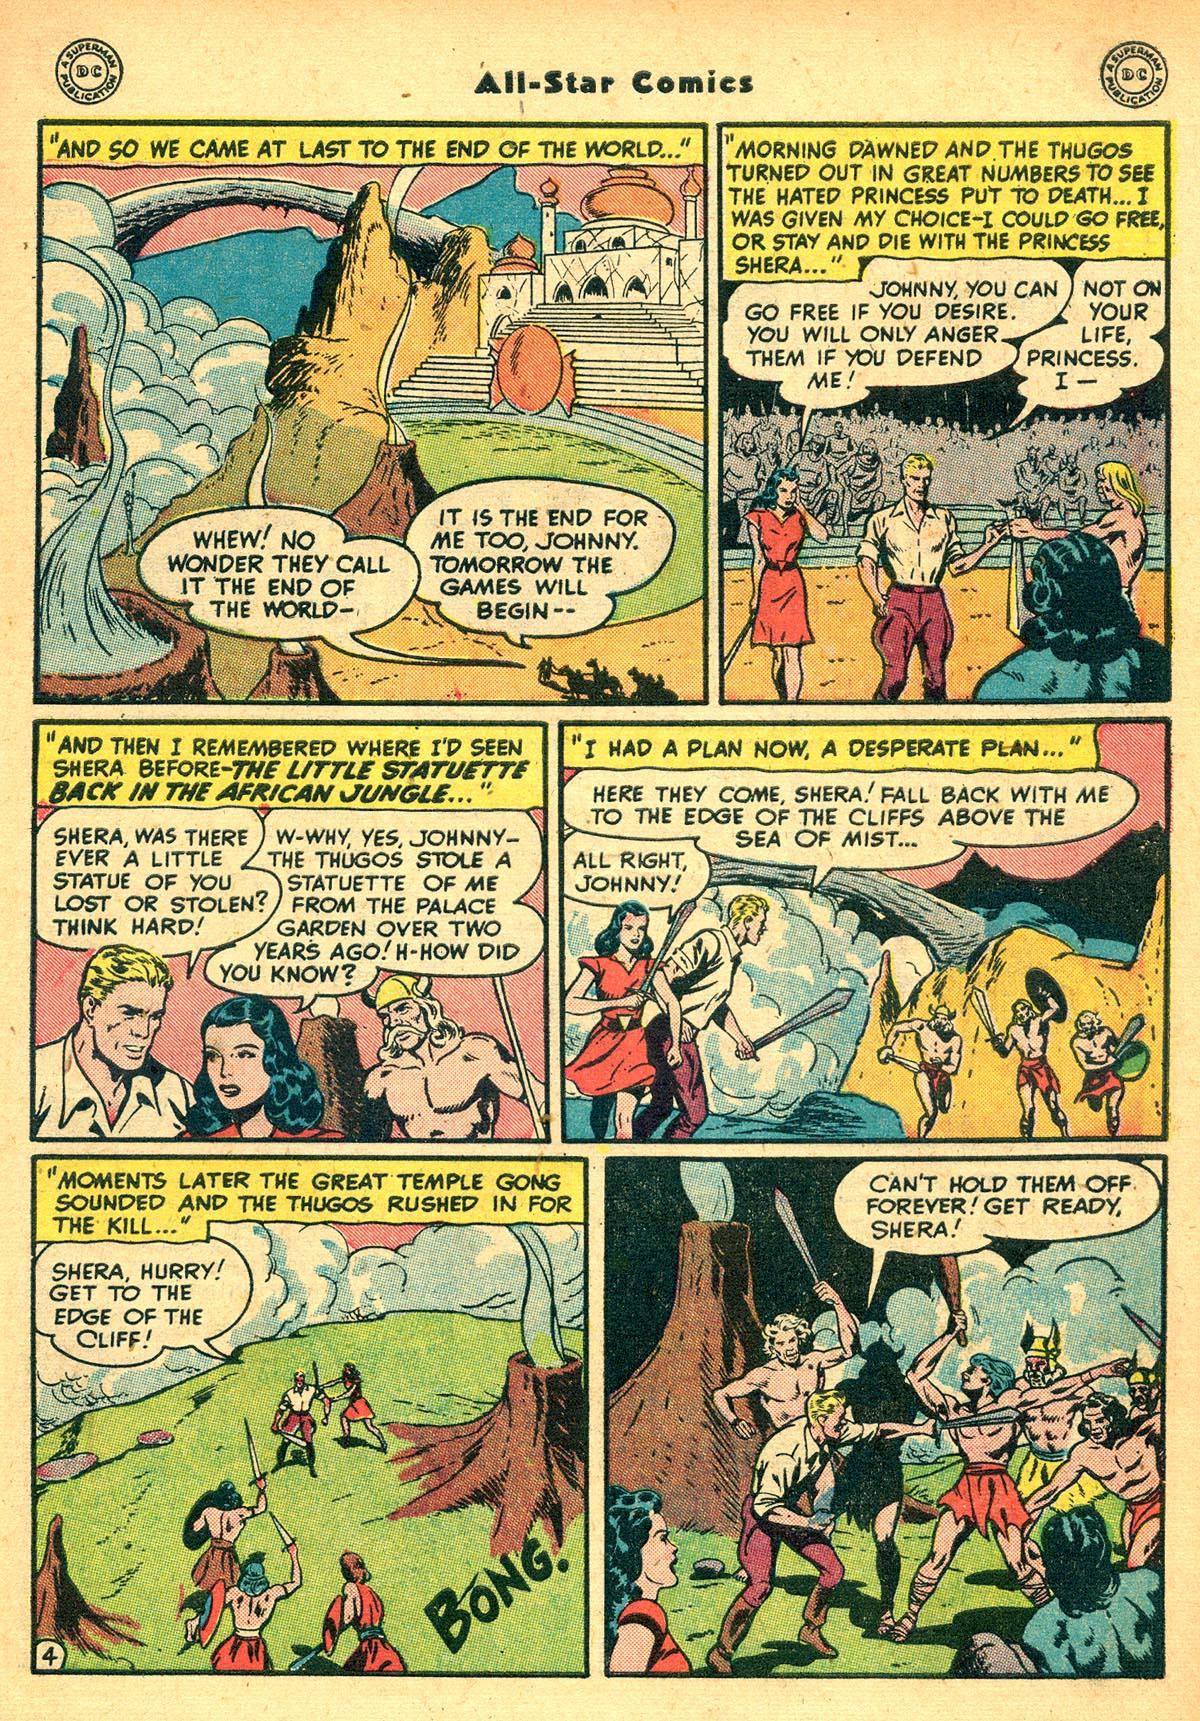 Read online All-Star Comics comic -  Issue #48 - 47